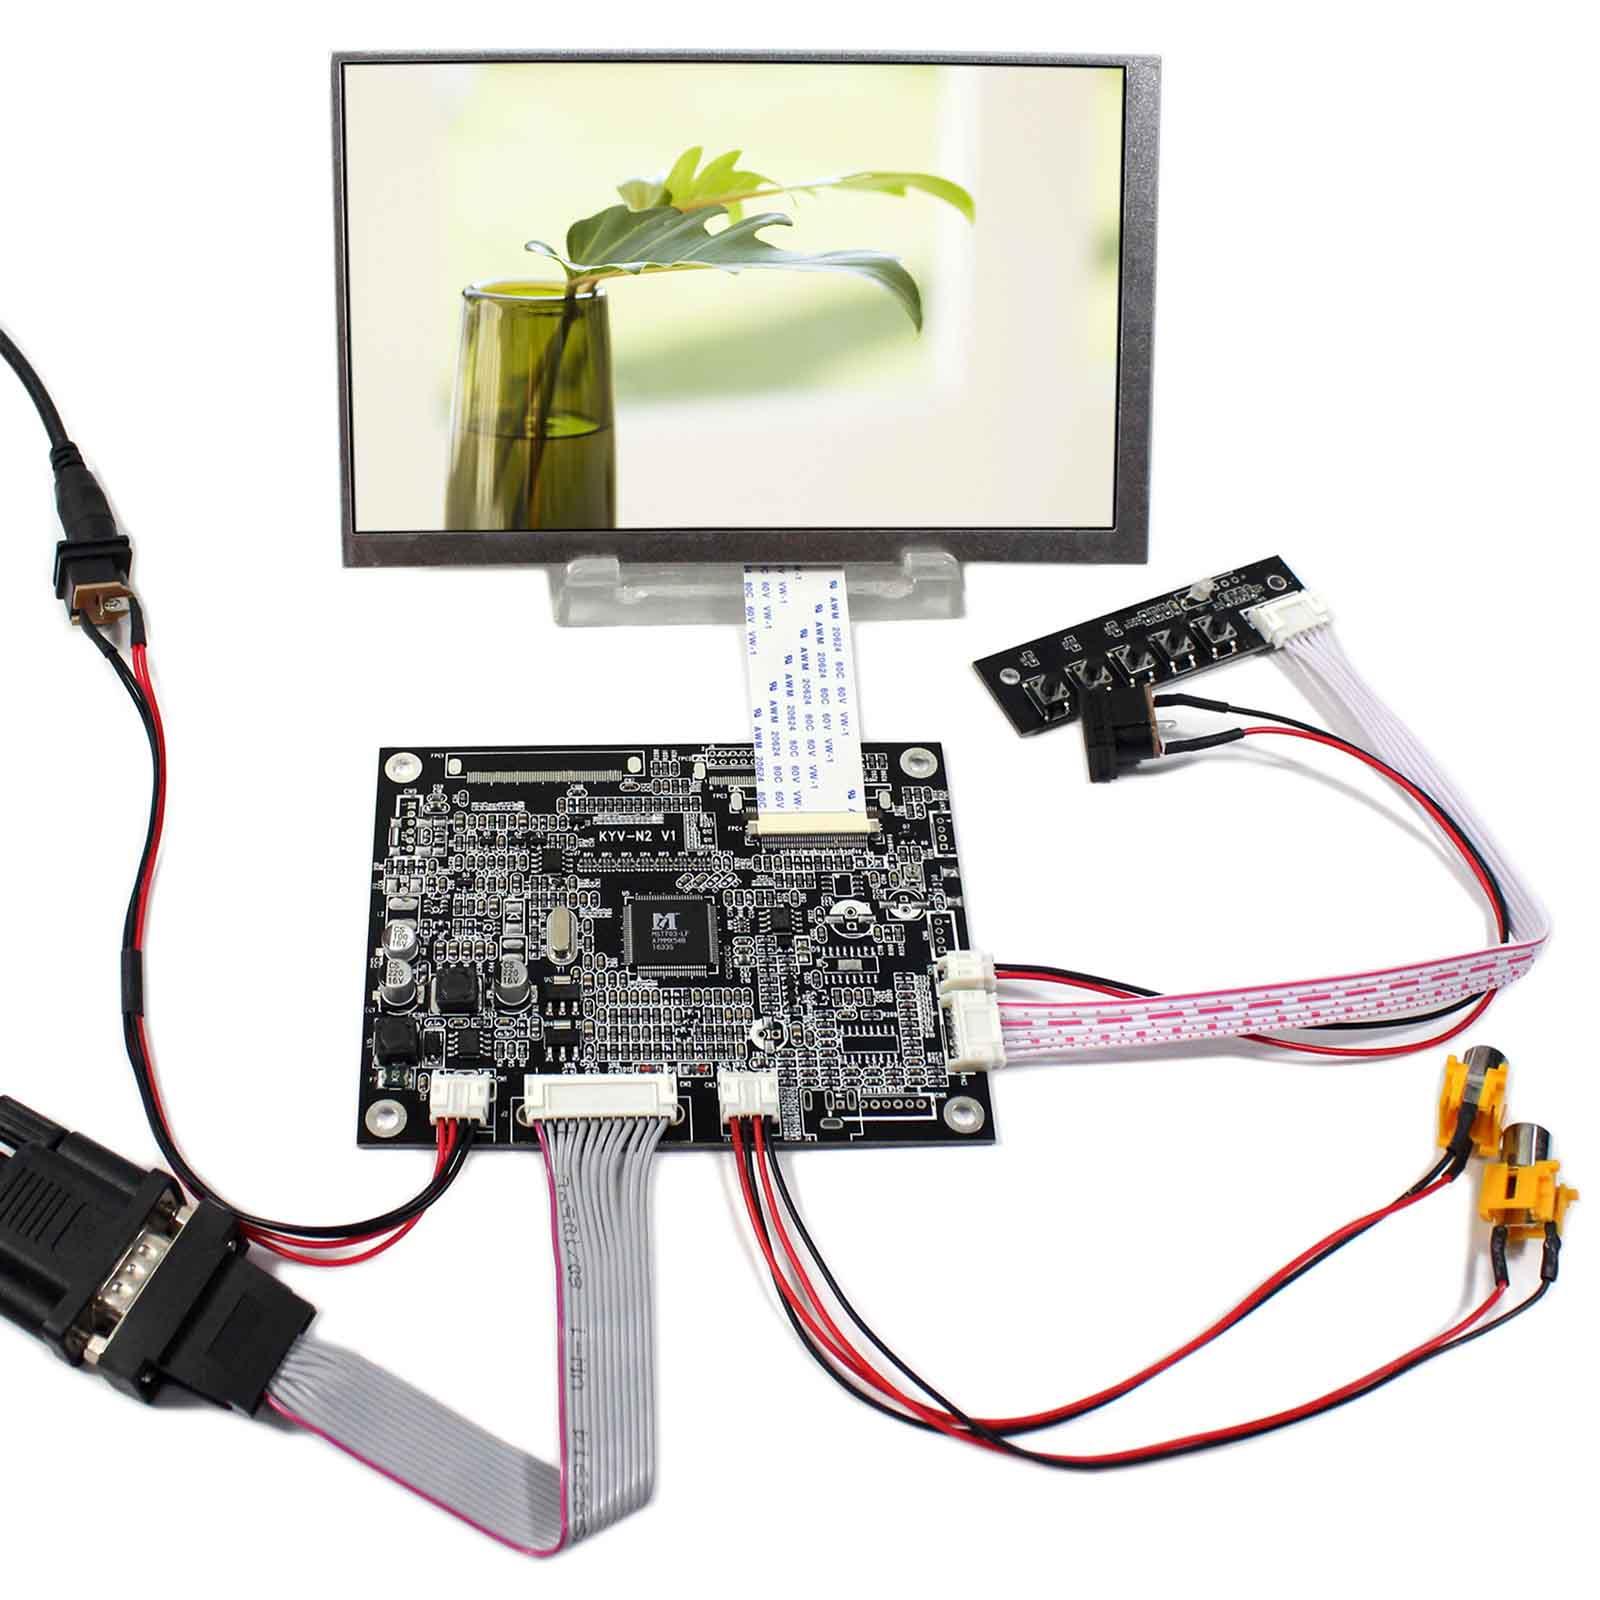 VGA+2AV Reversing LCD Controller Board With 7inch 800x480 AT070TN83 LCD Screen vga 2av reversing lcd controller board with 7inch 1024x600 at070tna2 lcd screen